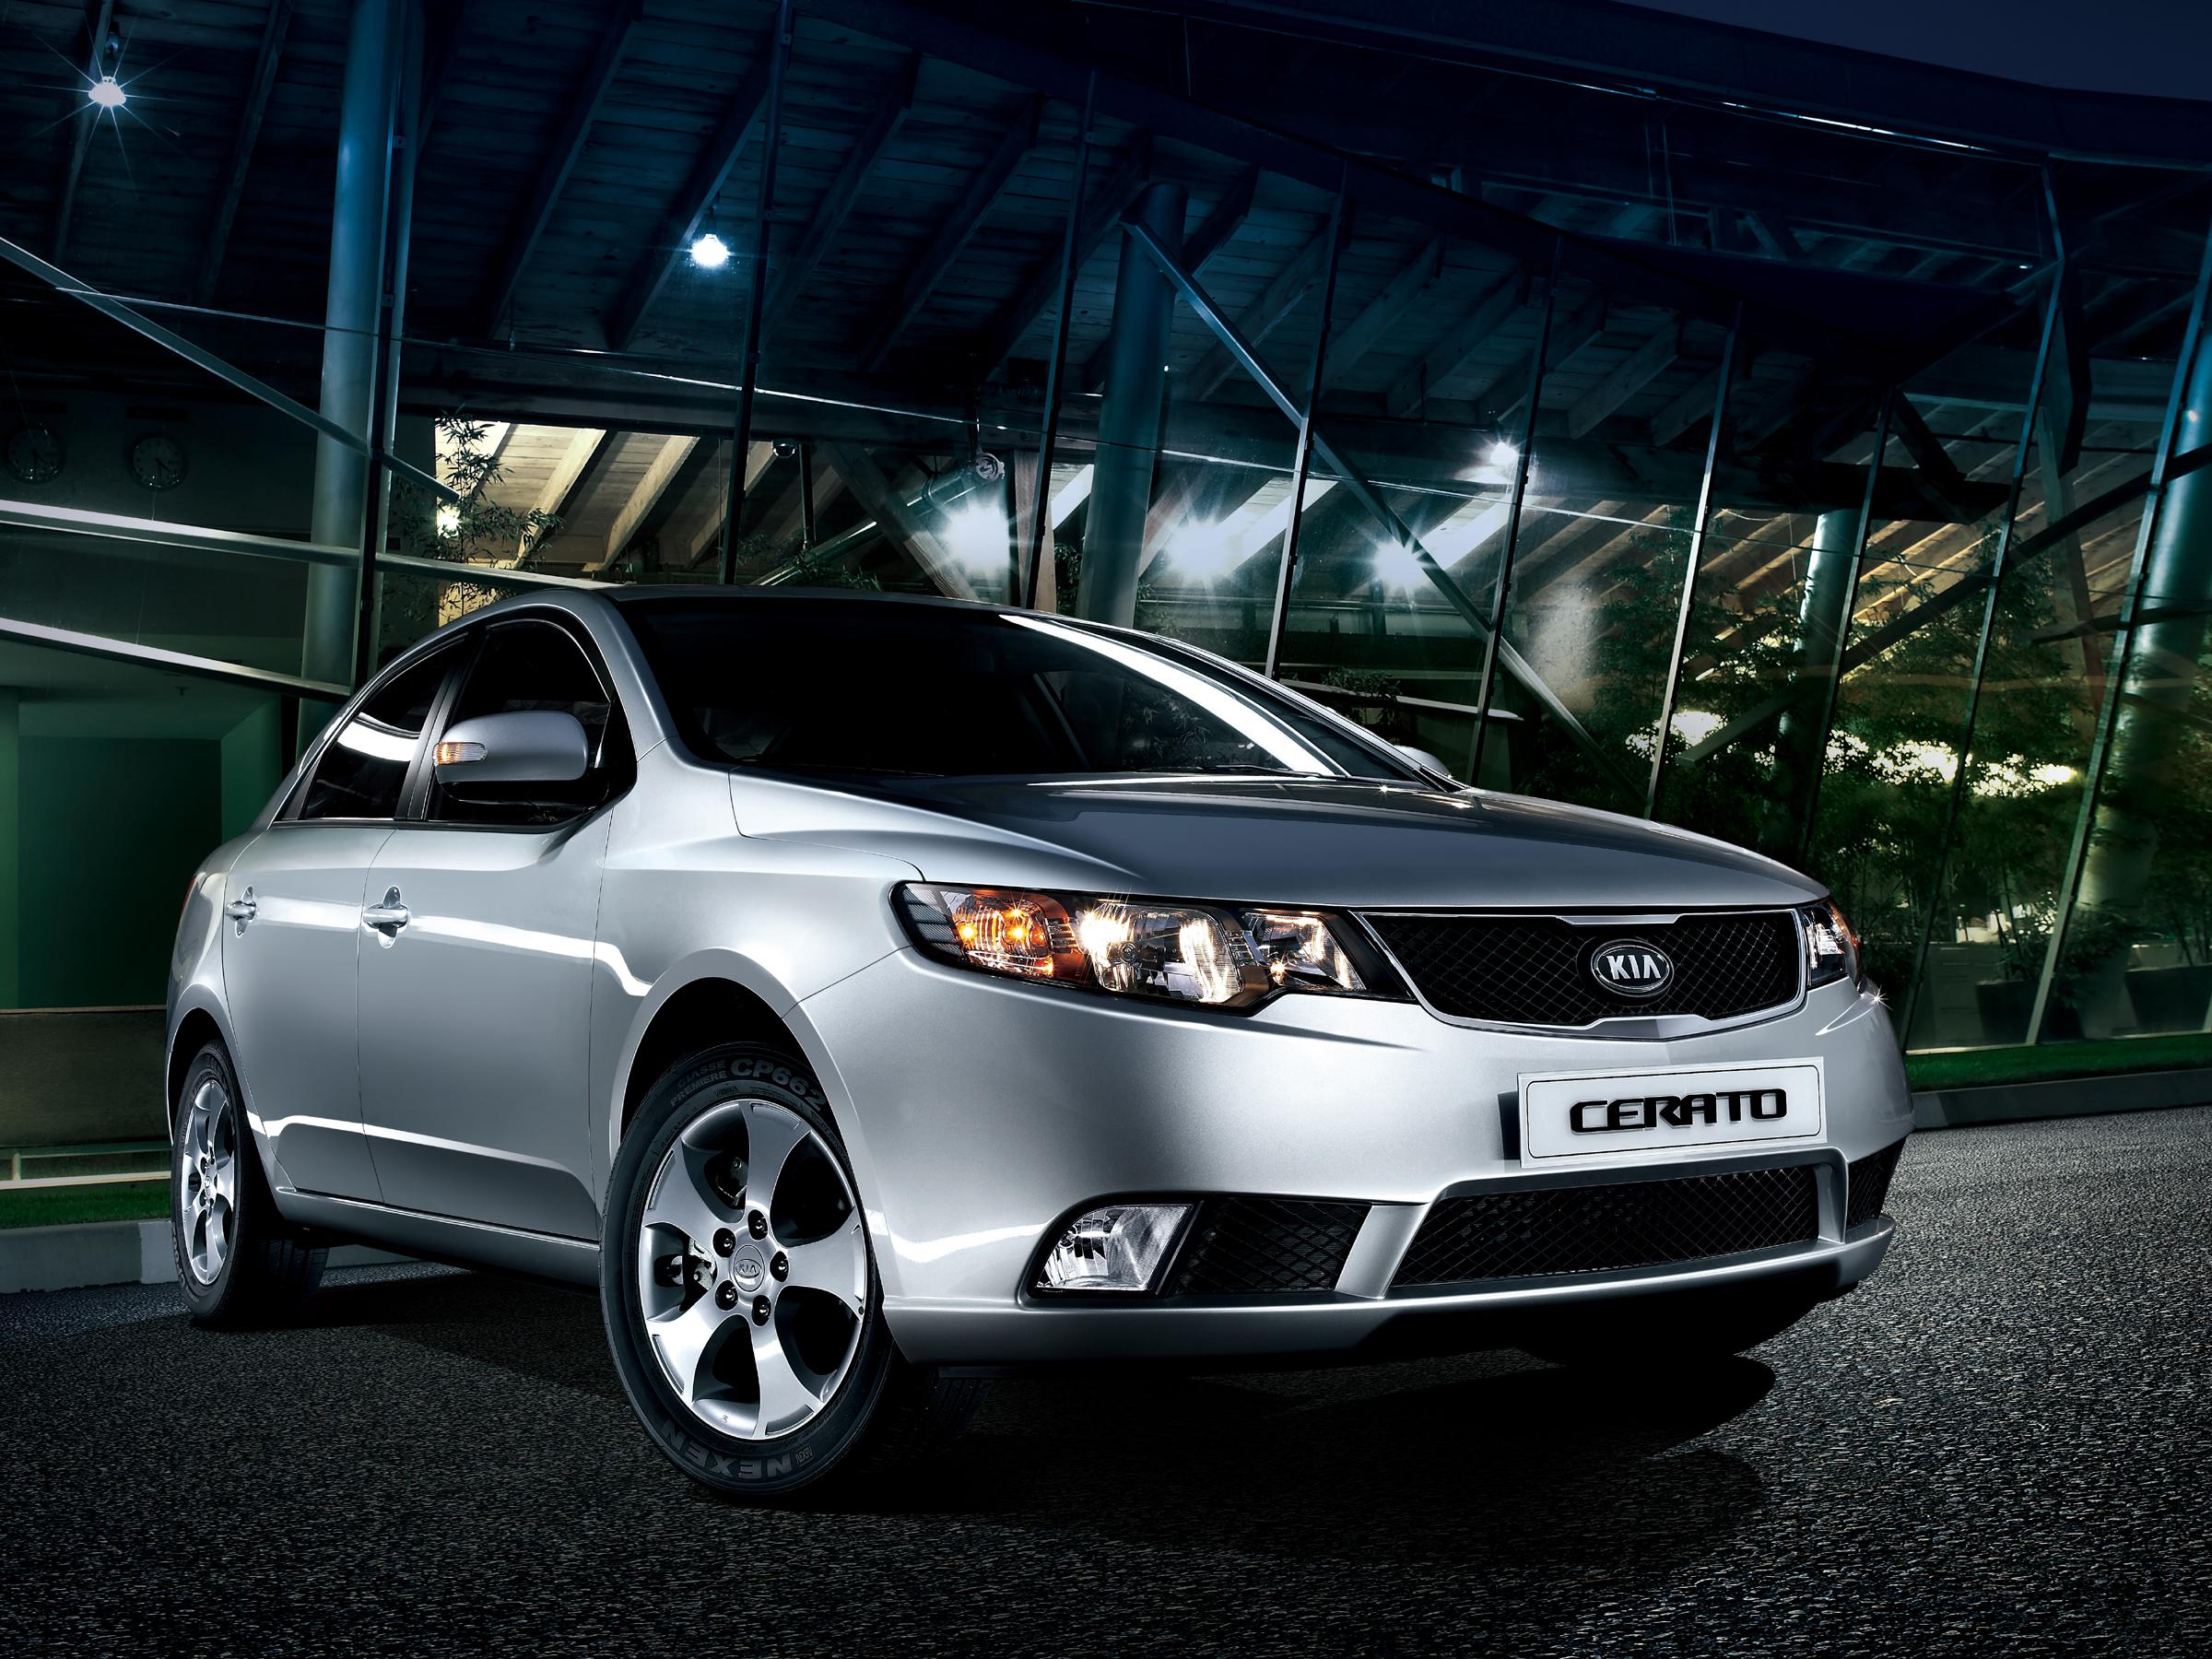 My Perfect Kia Cerato 3dtuning Probably The Best Car Configurator K3 Fuse Box Sedan 2012